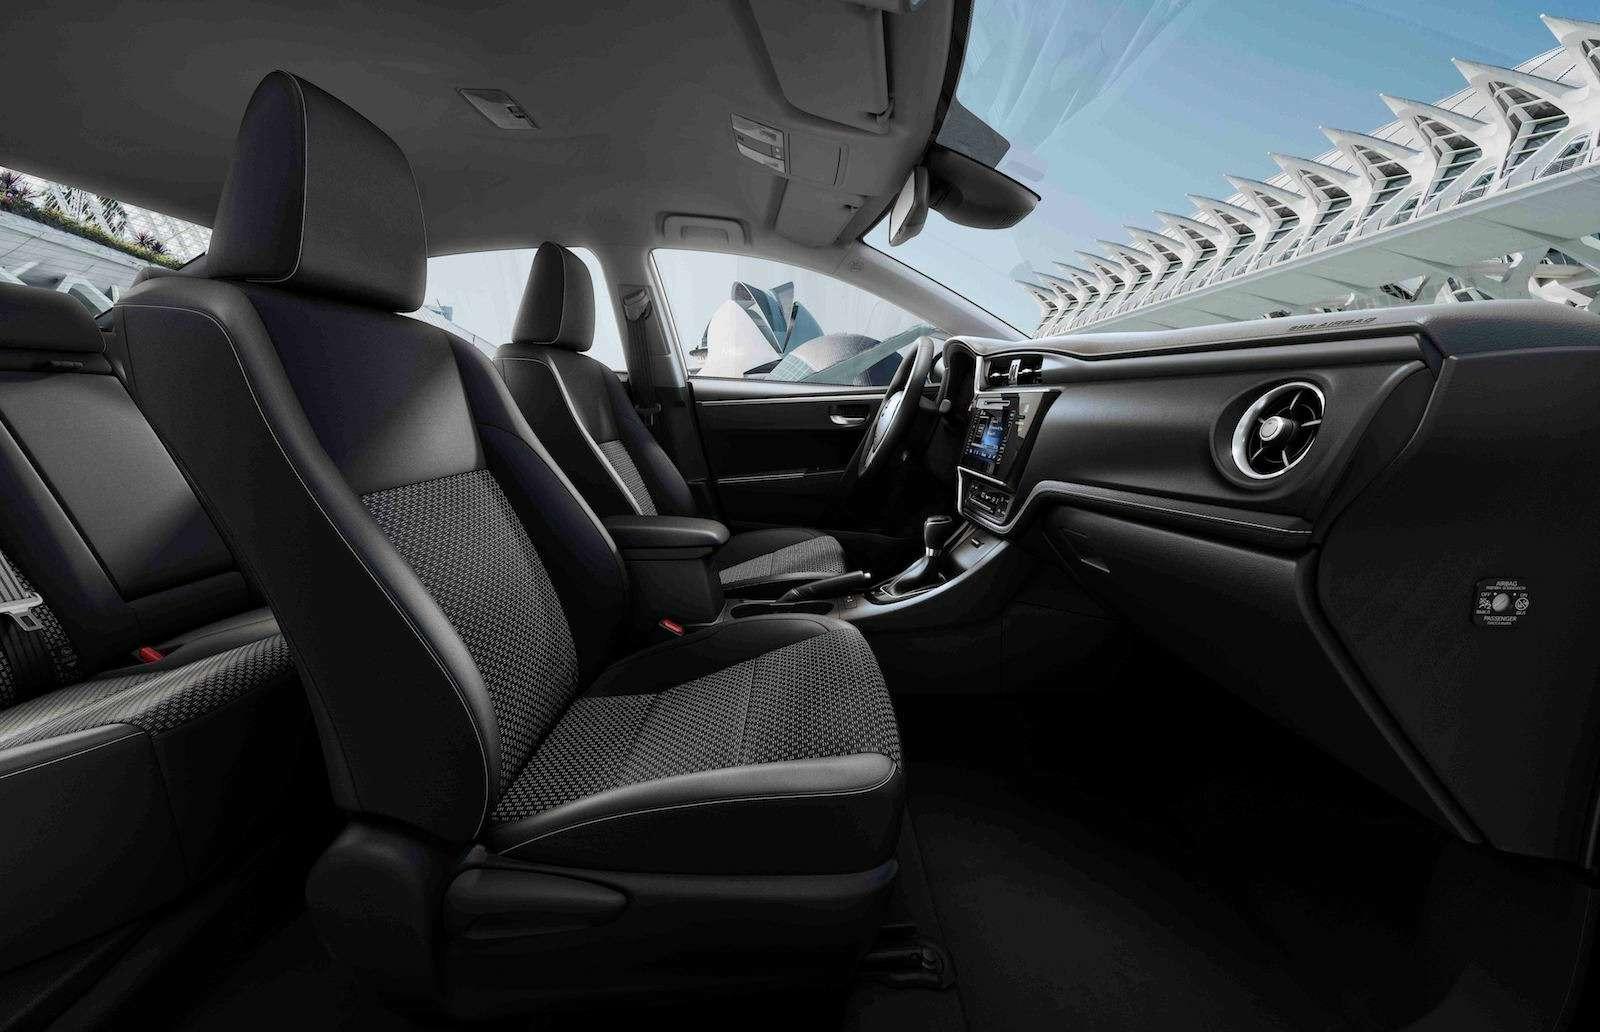 Toyota представила обновленный седан Corolla— фото 599030